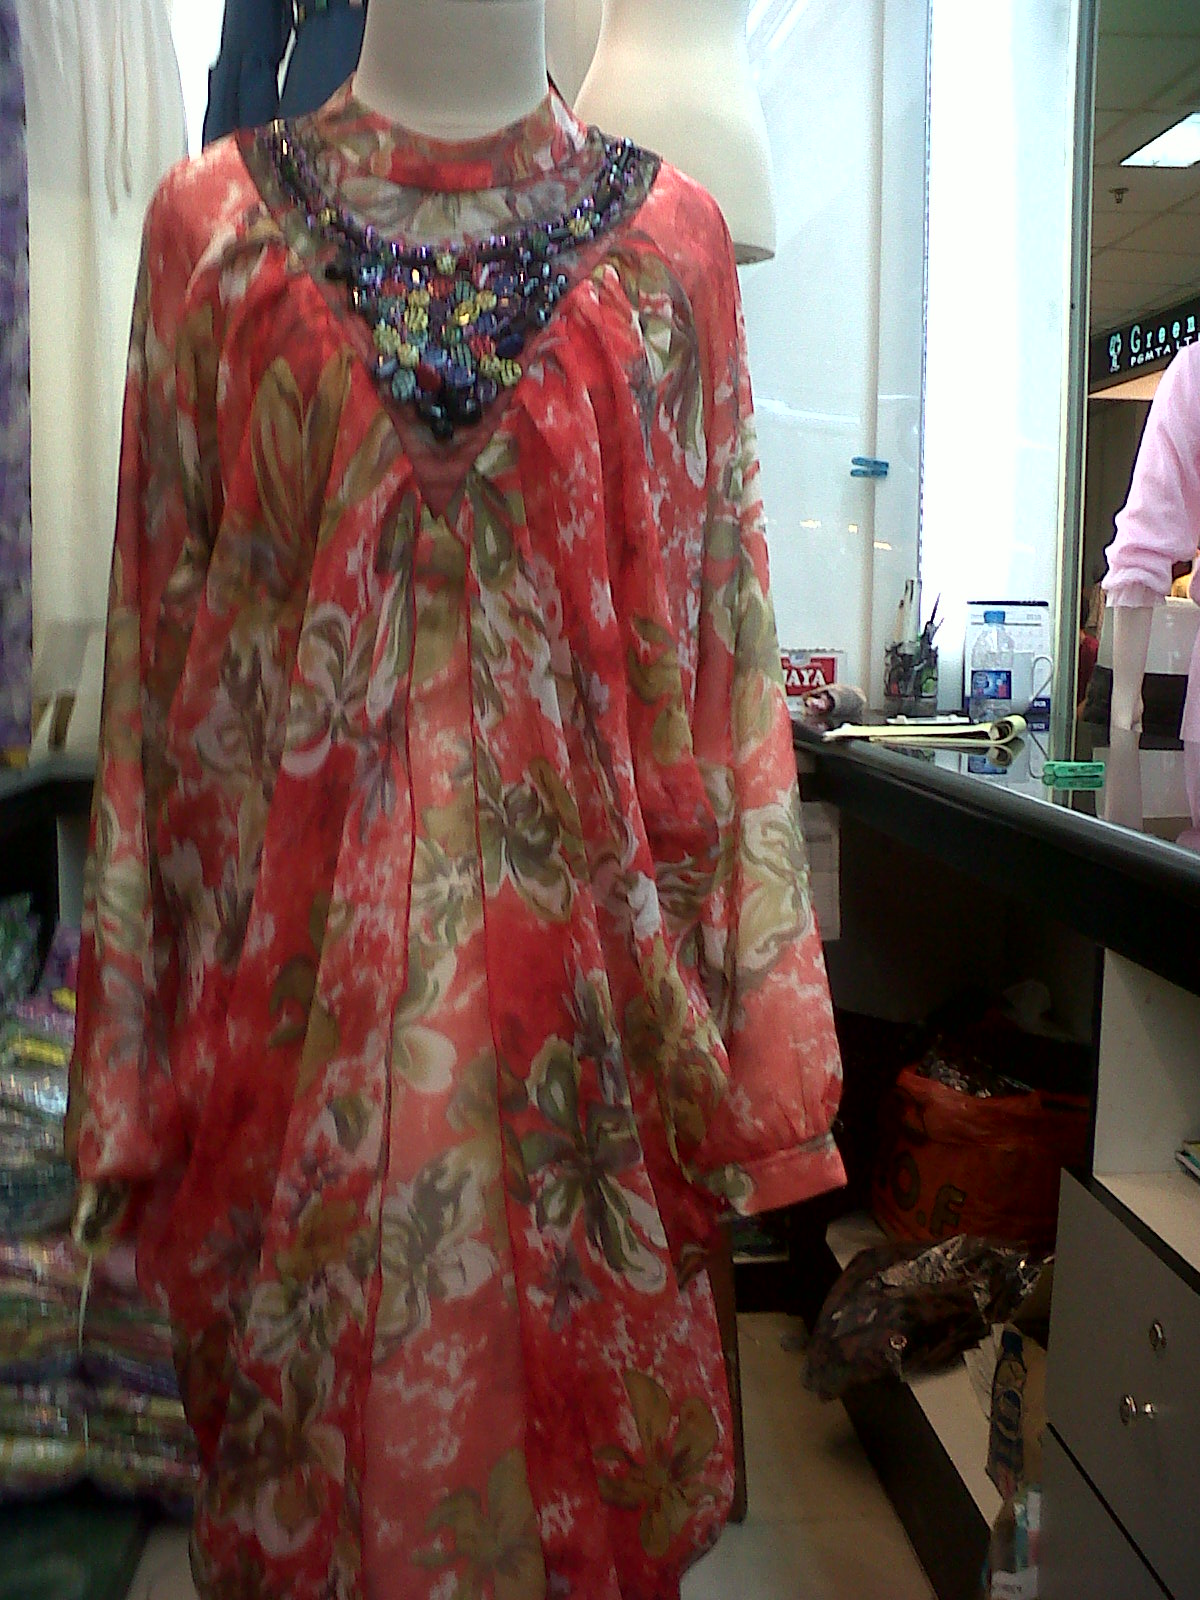 Koleksi baju santai syahrini koleksi baju syahrini Baju gamis santai